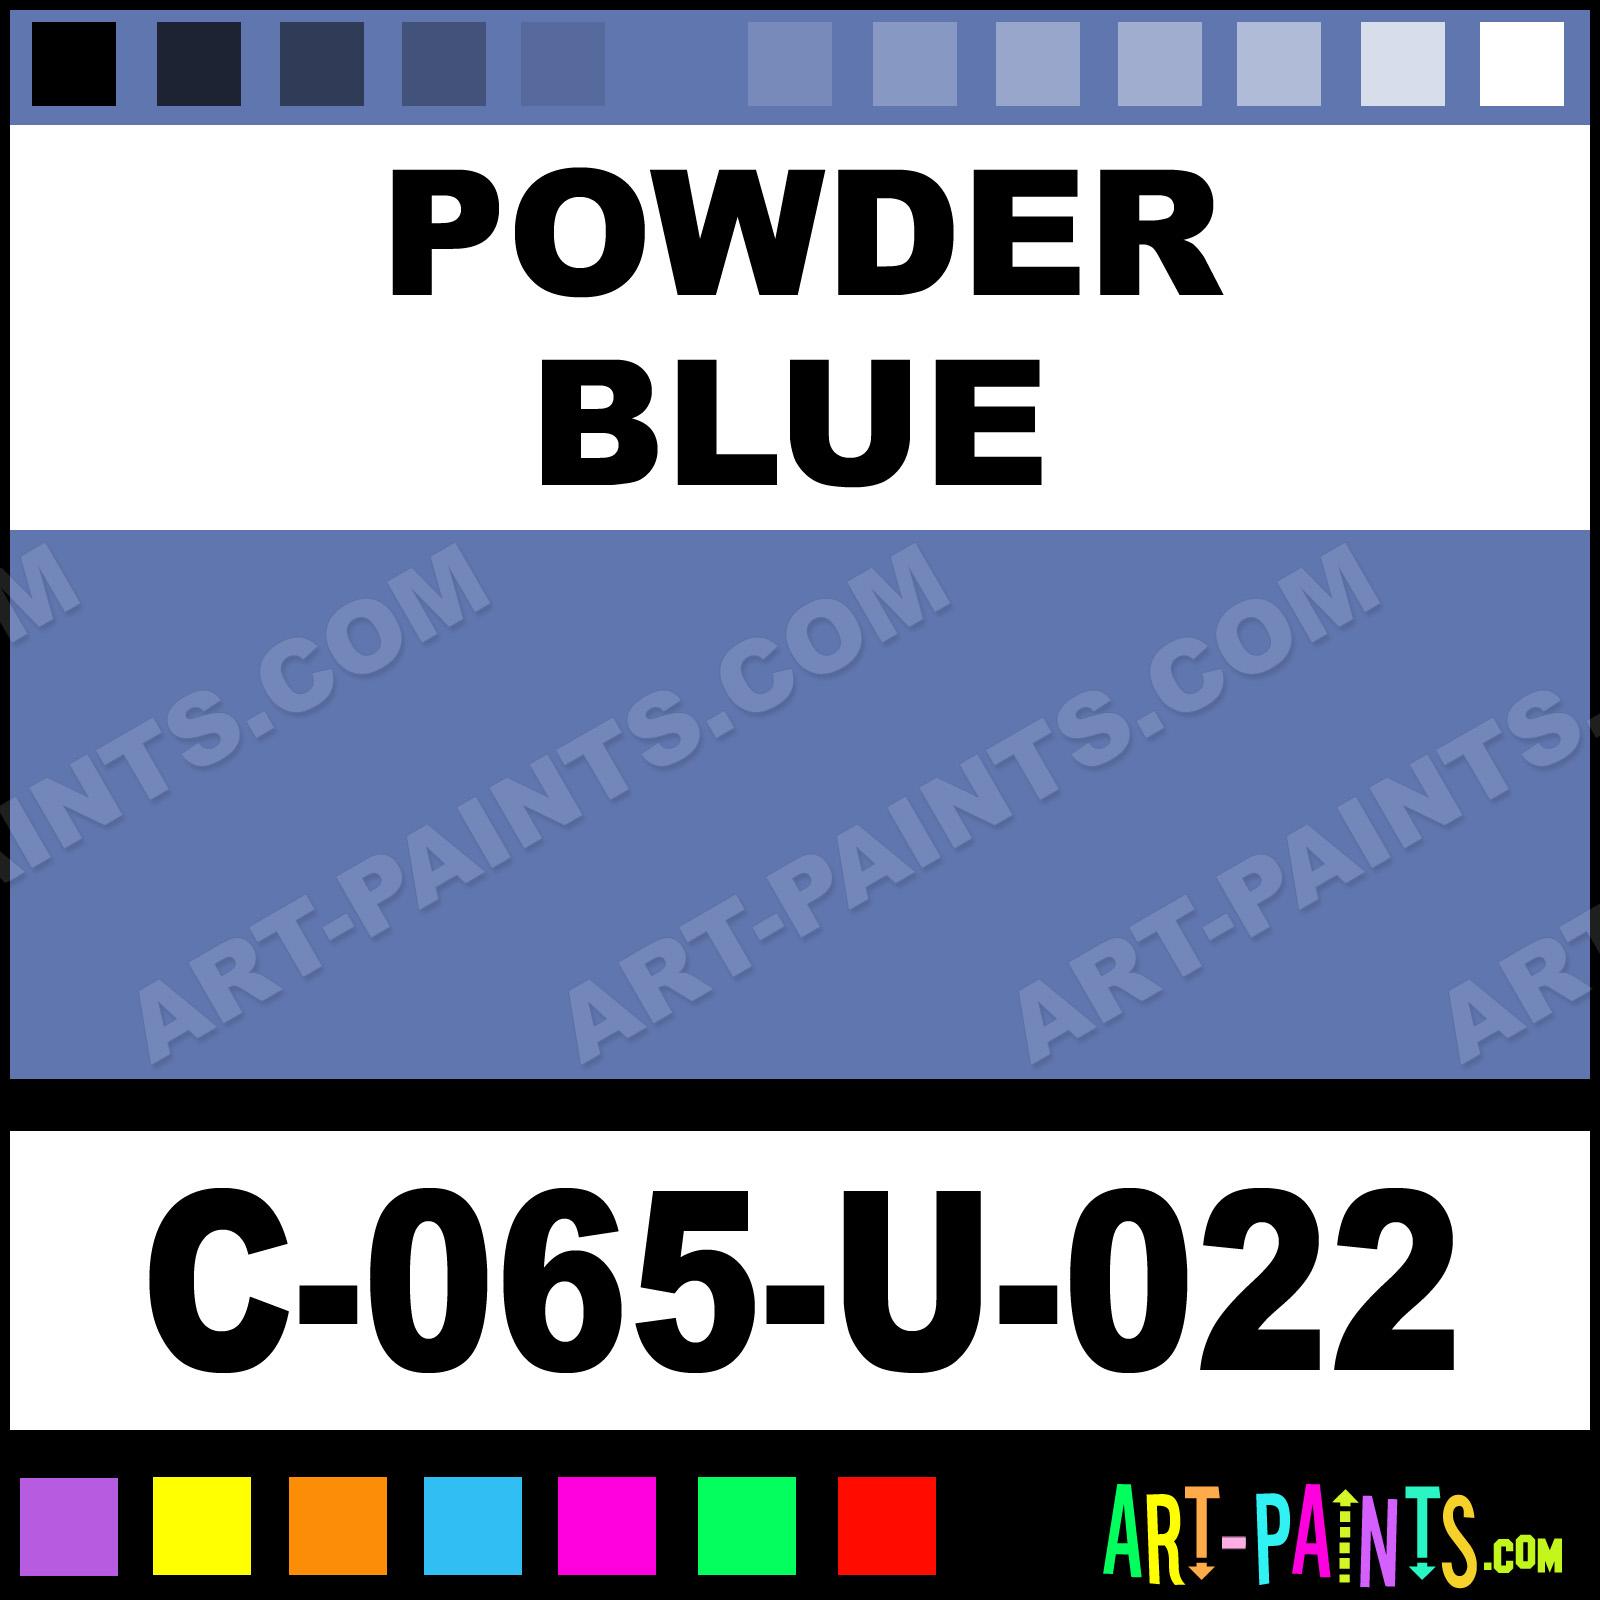 Powder Blue Liquid High Fire Underglaze Ceramic Paints - C-065-U-022